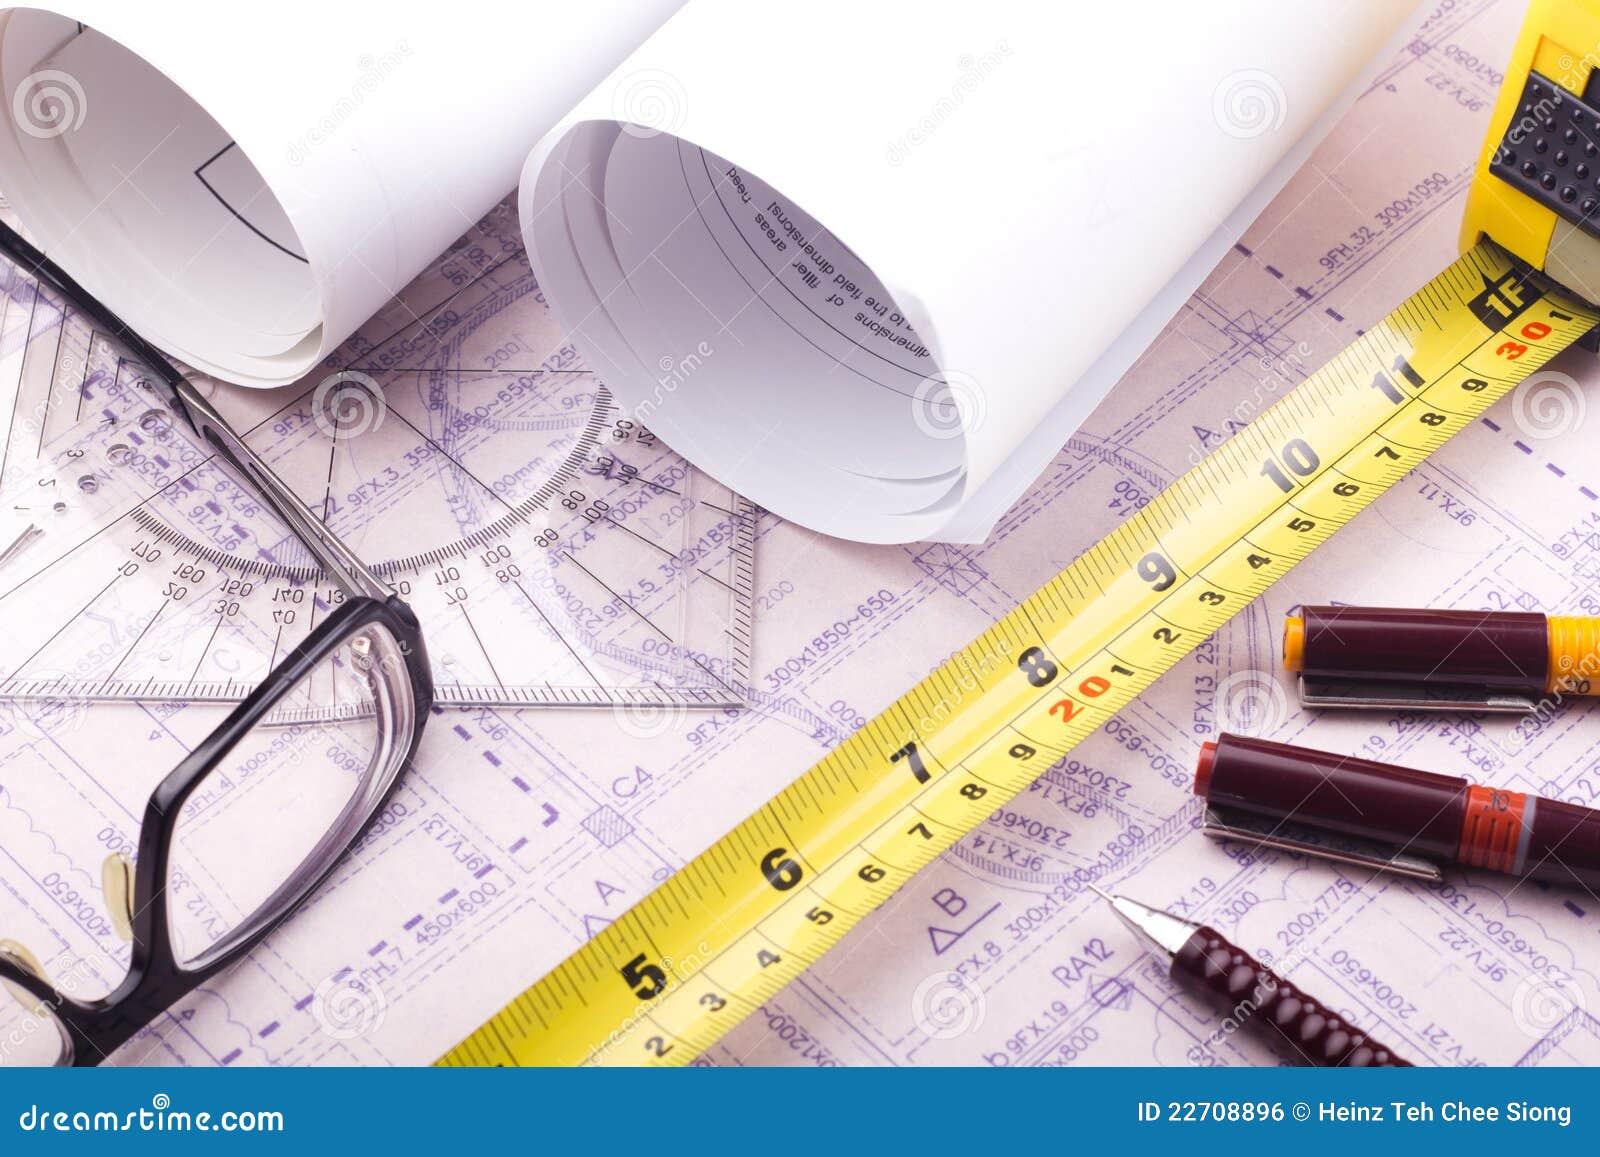 Designing A House Floor Plan House Plan Blueprint Architect Design Royalty Free Stock